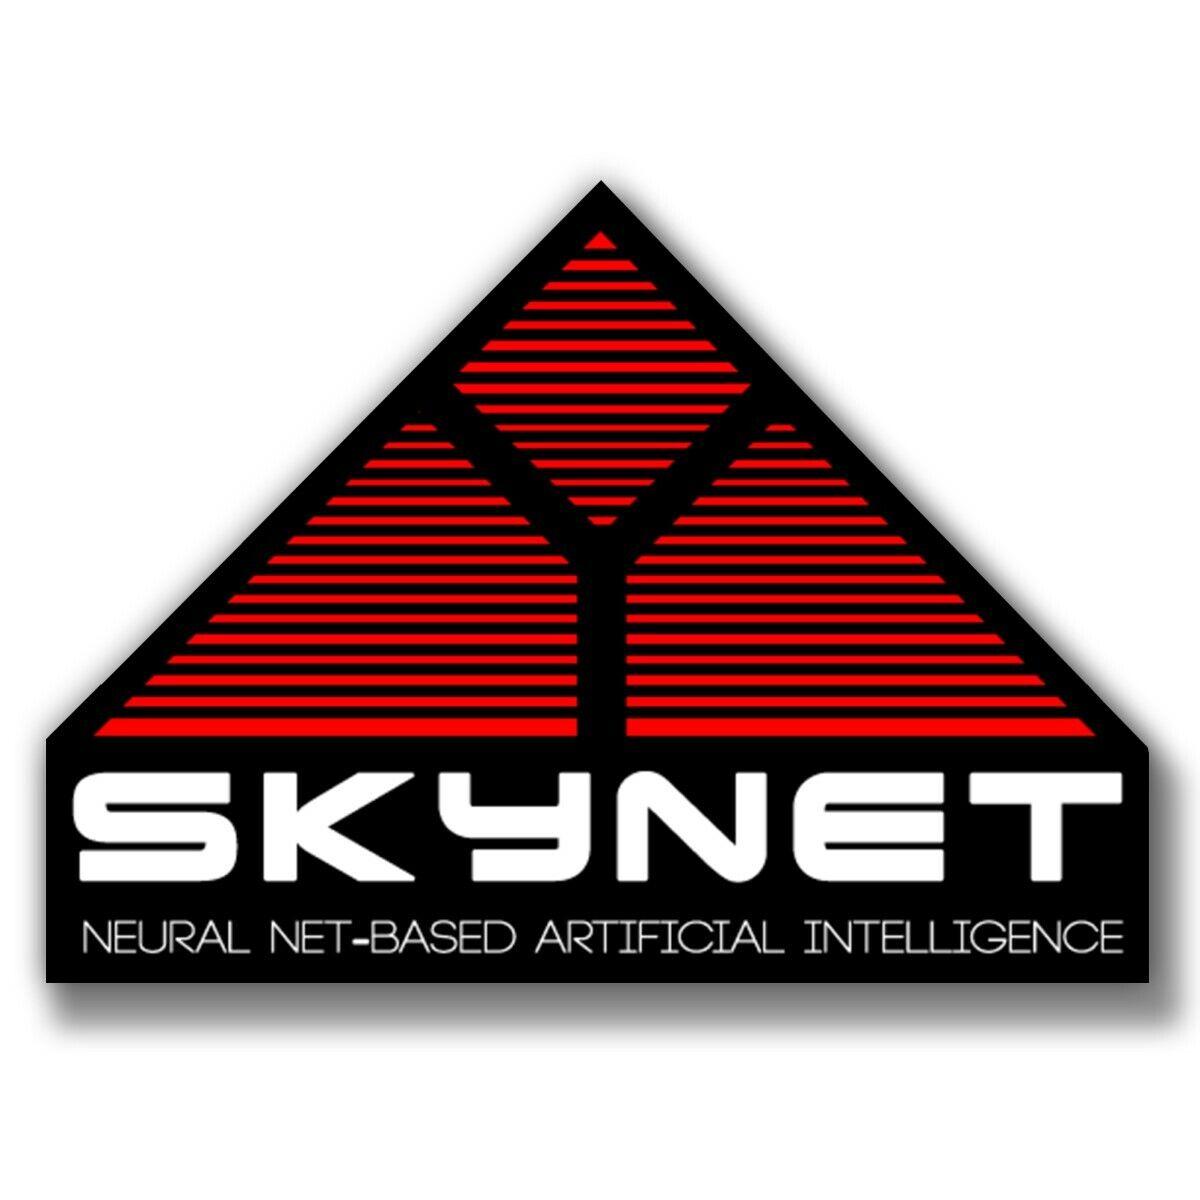 "Home Decoration - Vinyl Sticker Decal Skynet terminator movie Windows Car Phone Bumpers Laptop, 3"""